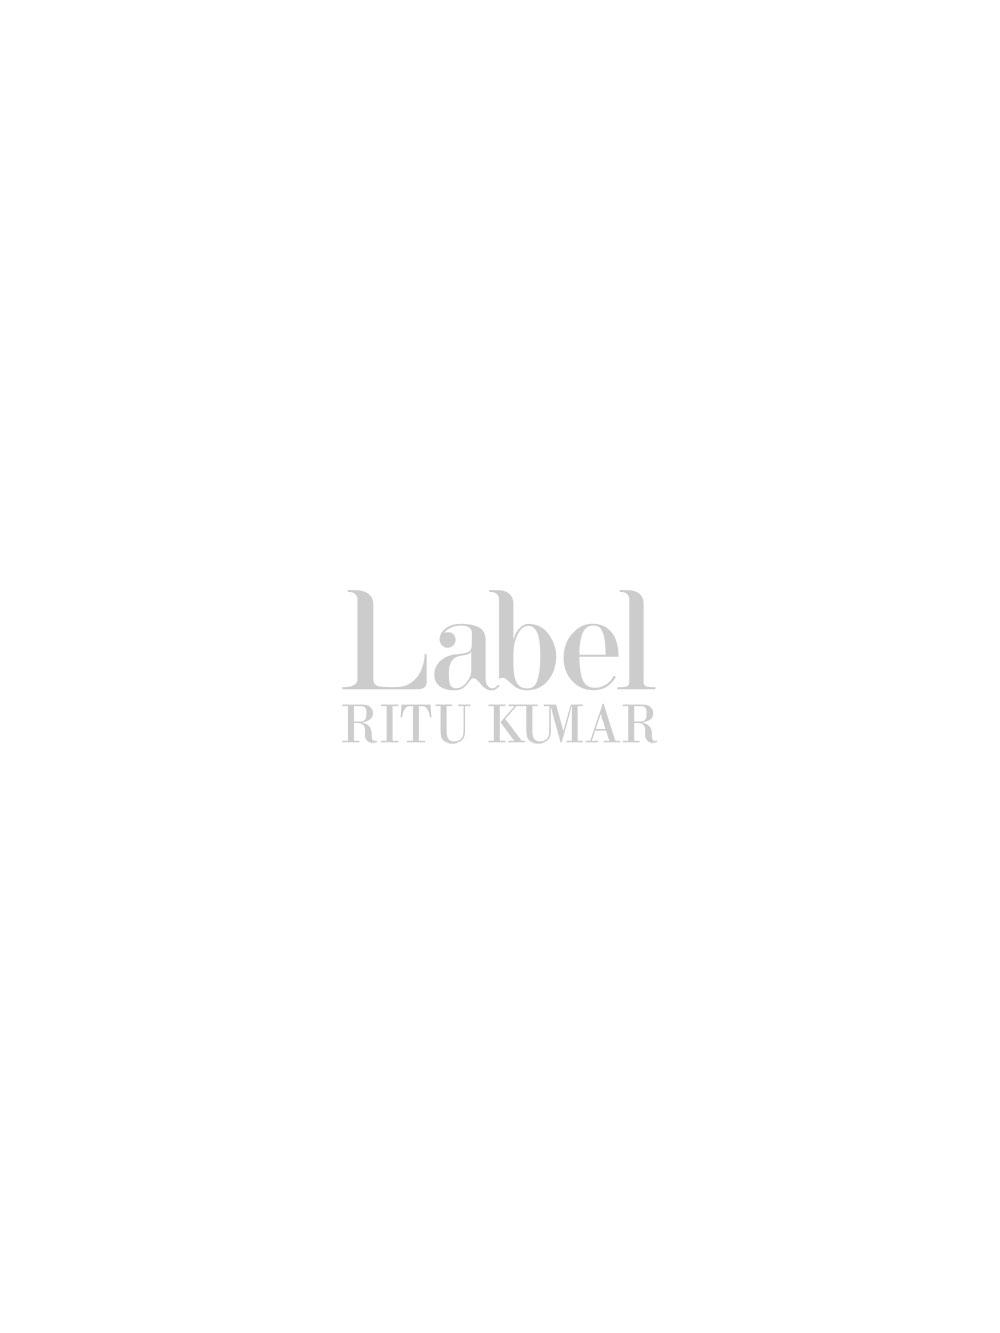 Turquoise Floral Print Dress By Label Ritu Kumar